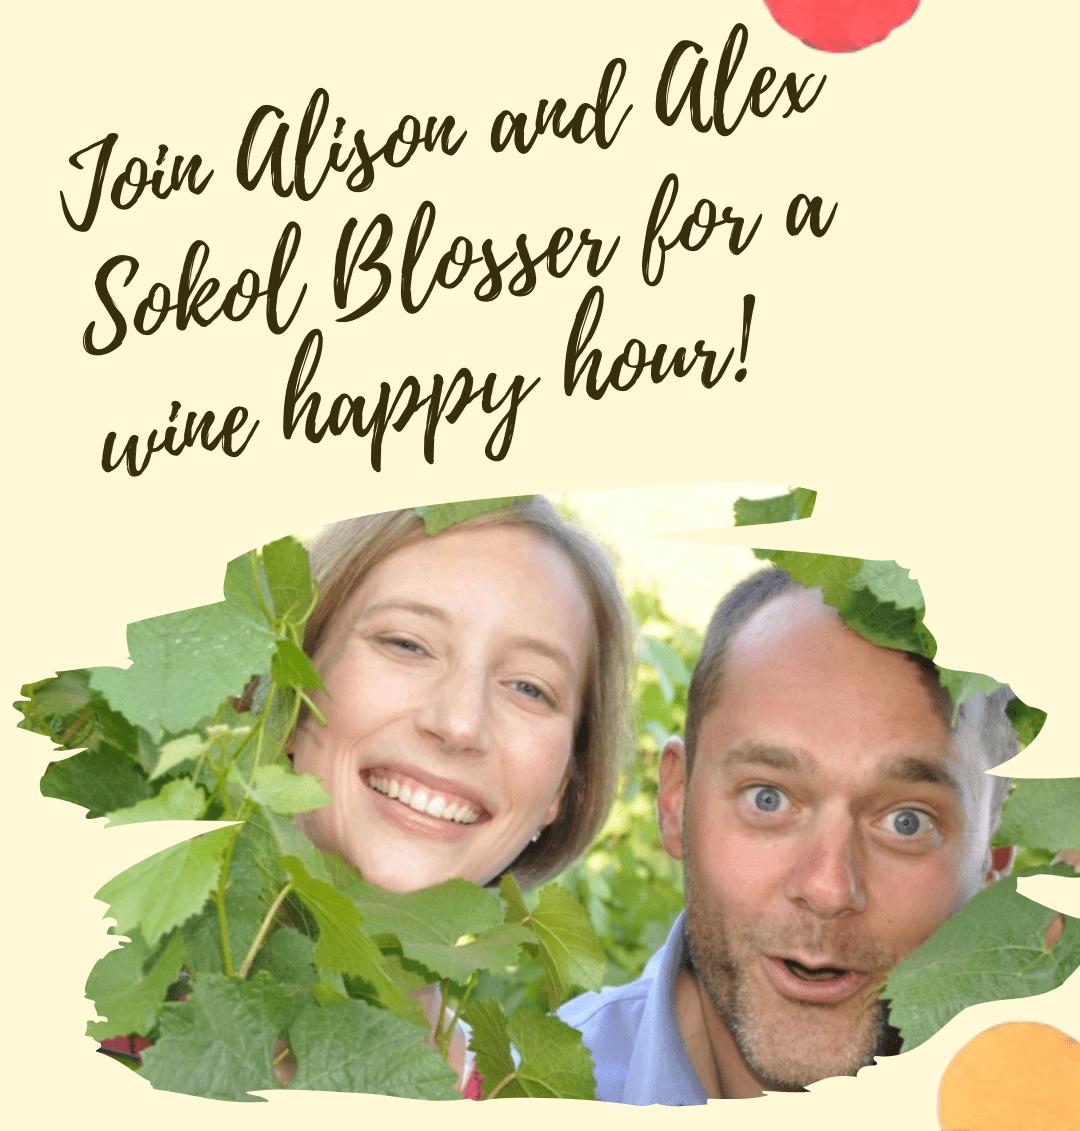 20200324 153538 0000 2 0HfU43.tmp  - Virtual Happy Hour with Alex and Alison Sokol Blosser